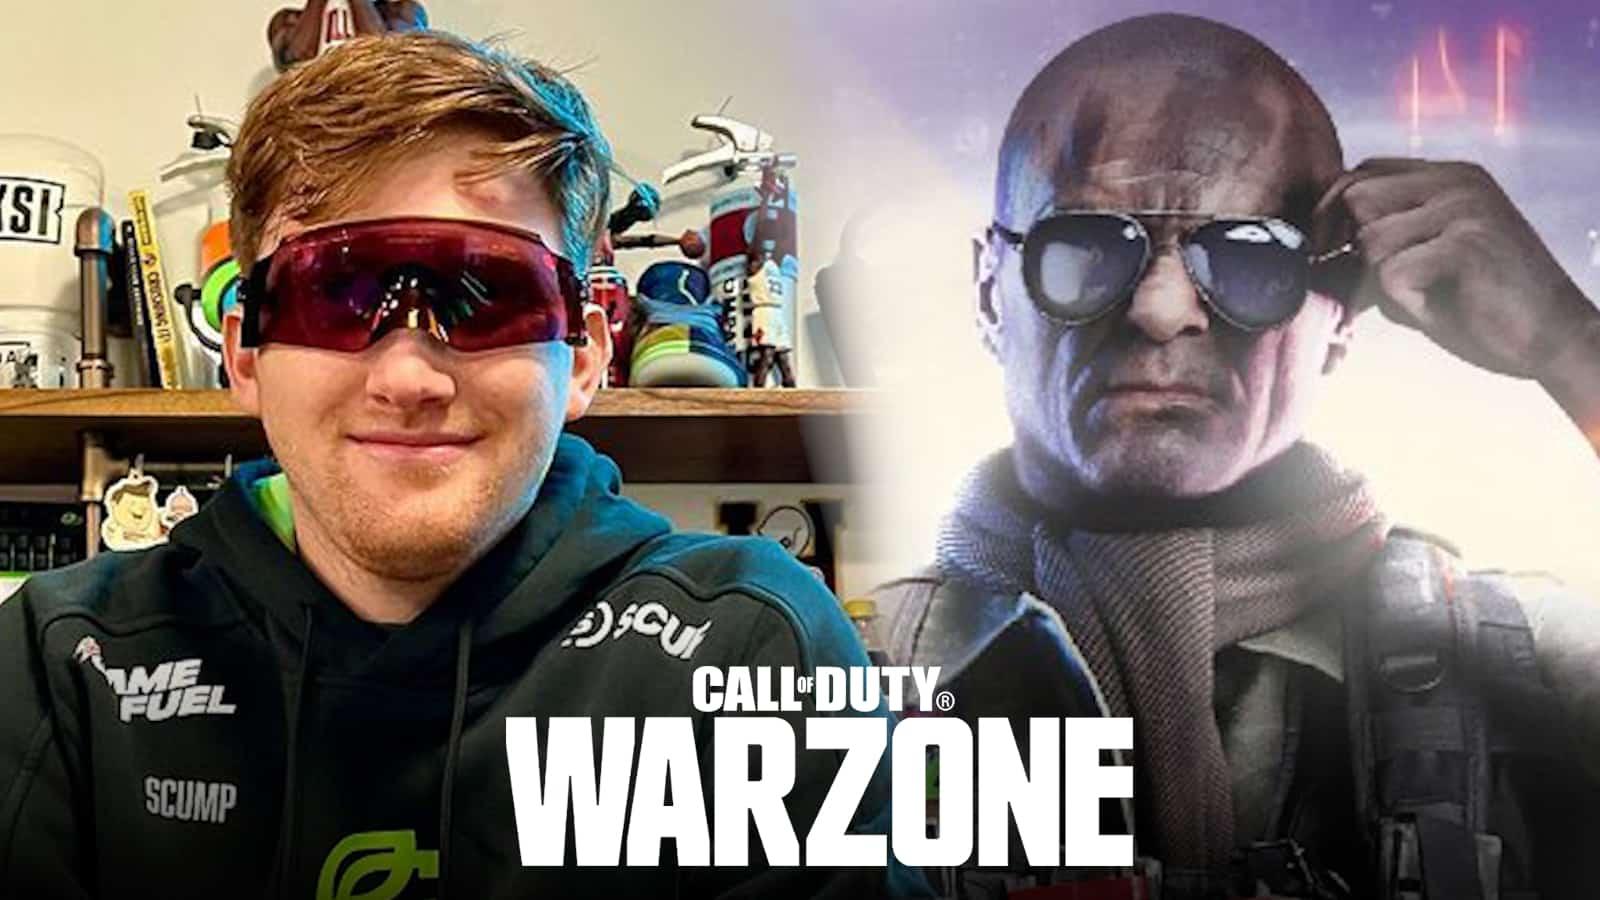 scump warzone hacker shut down accusations cod optic gaming